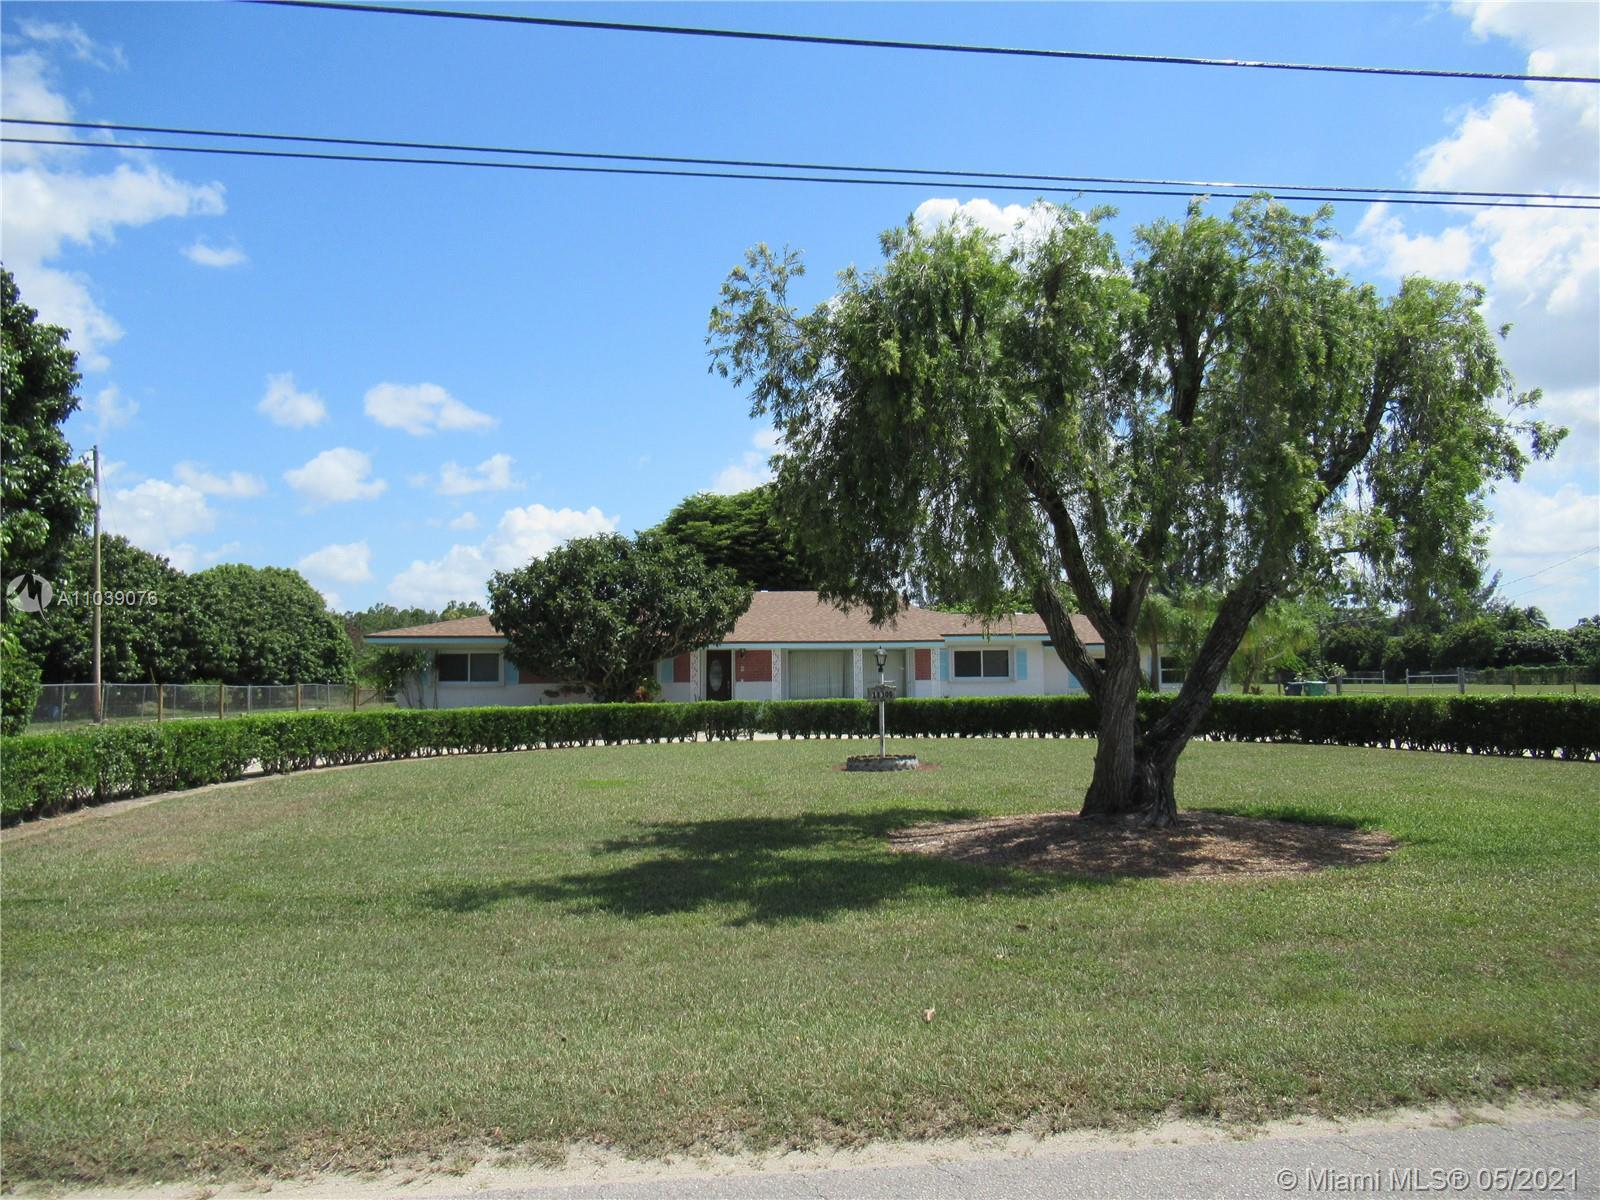 18300 Sw 264 St Property Photo